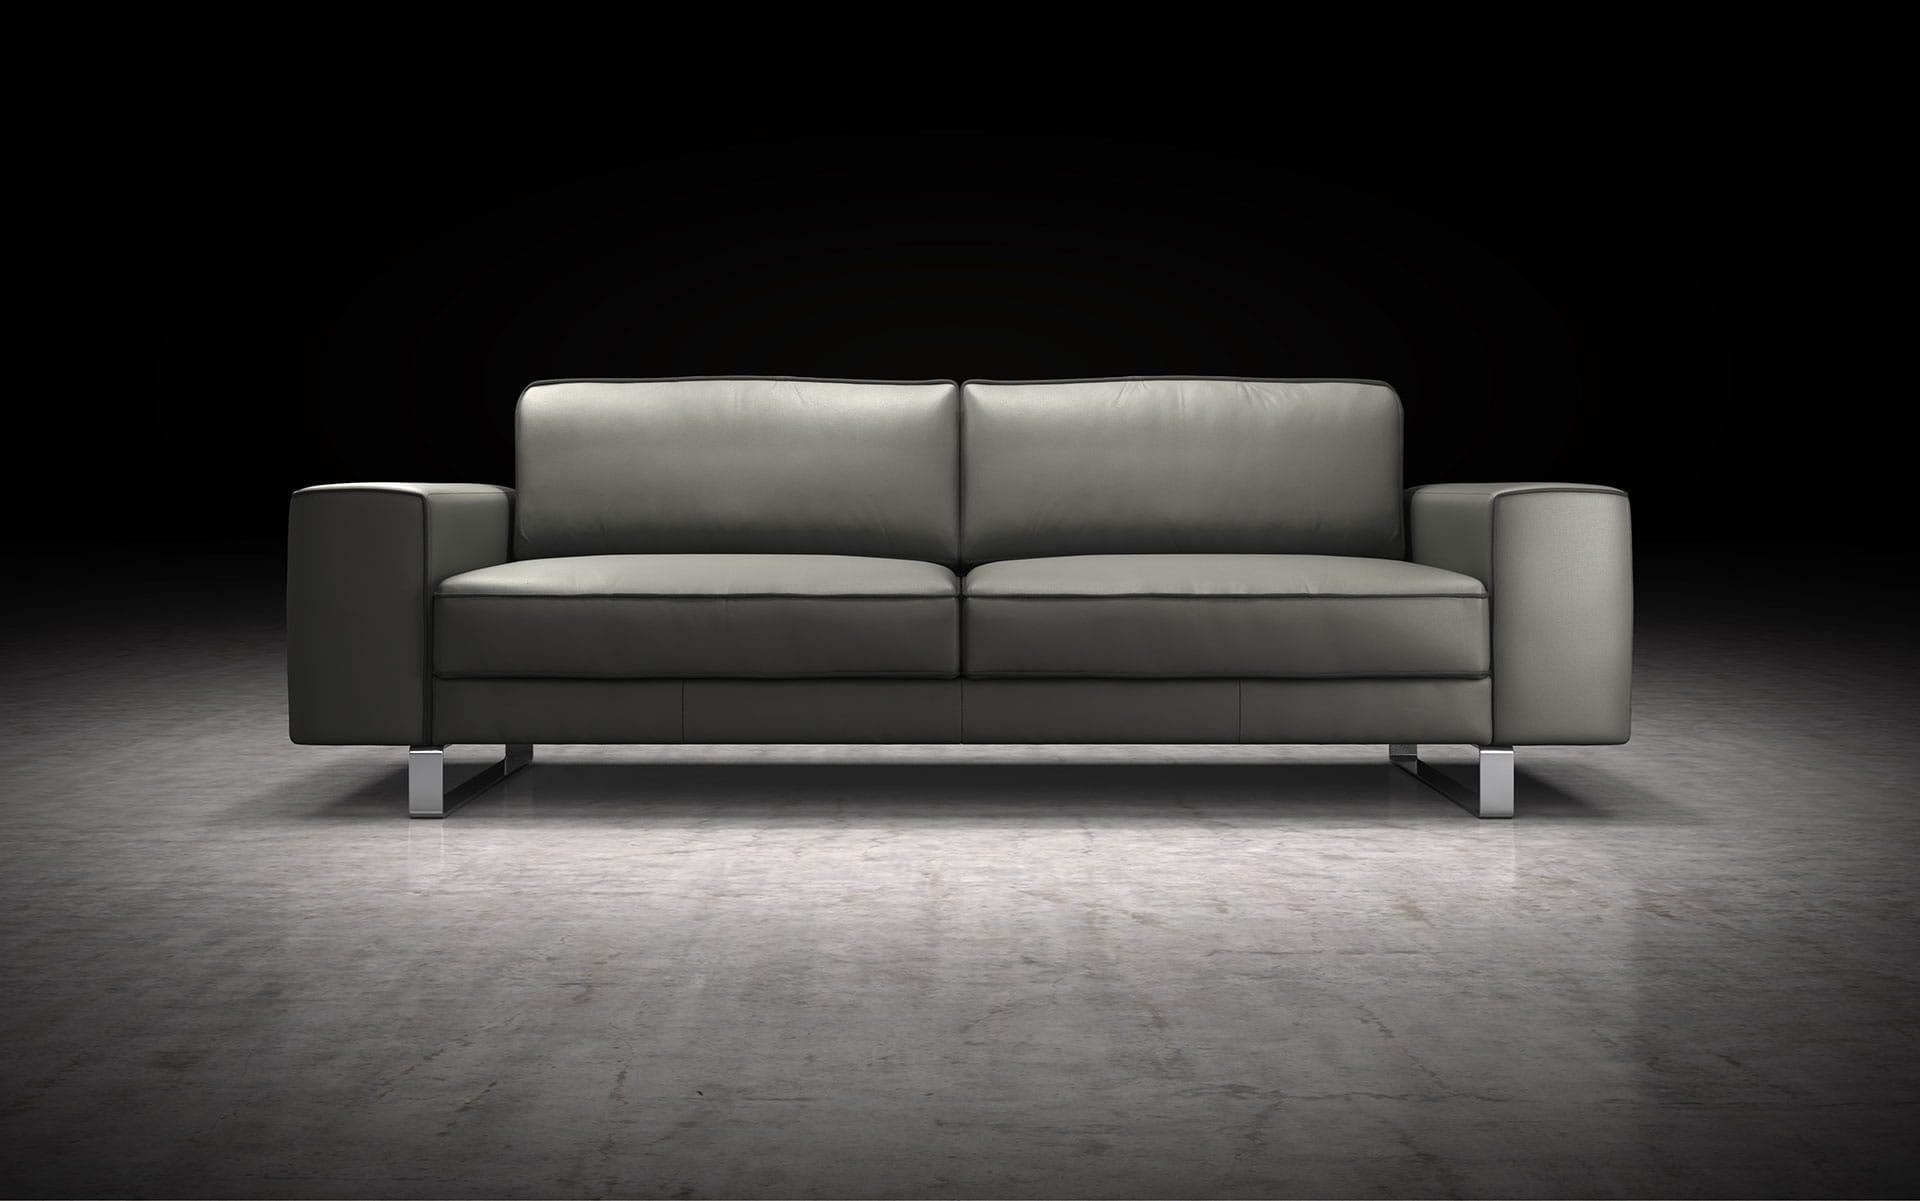 Waverly Sofa Warm Gray With Graphite By Modloft